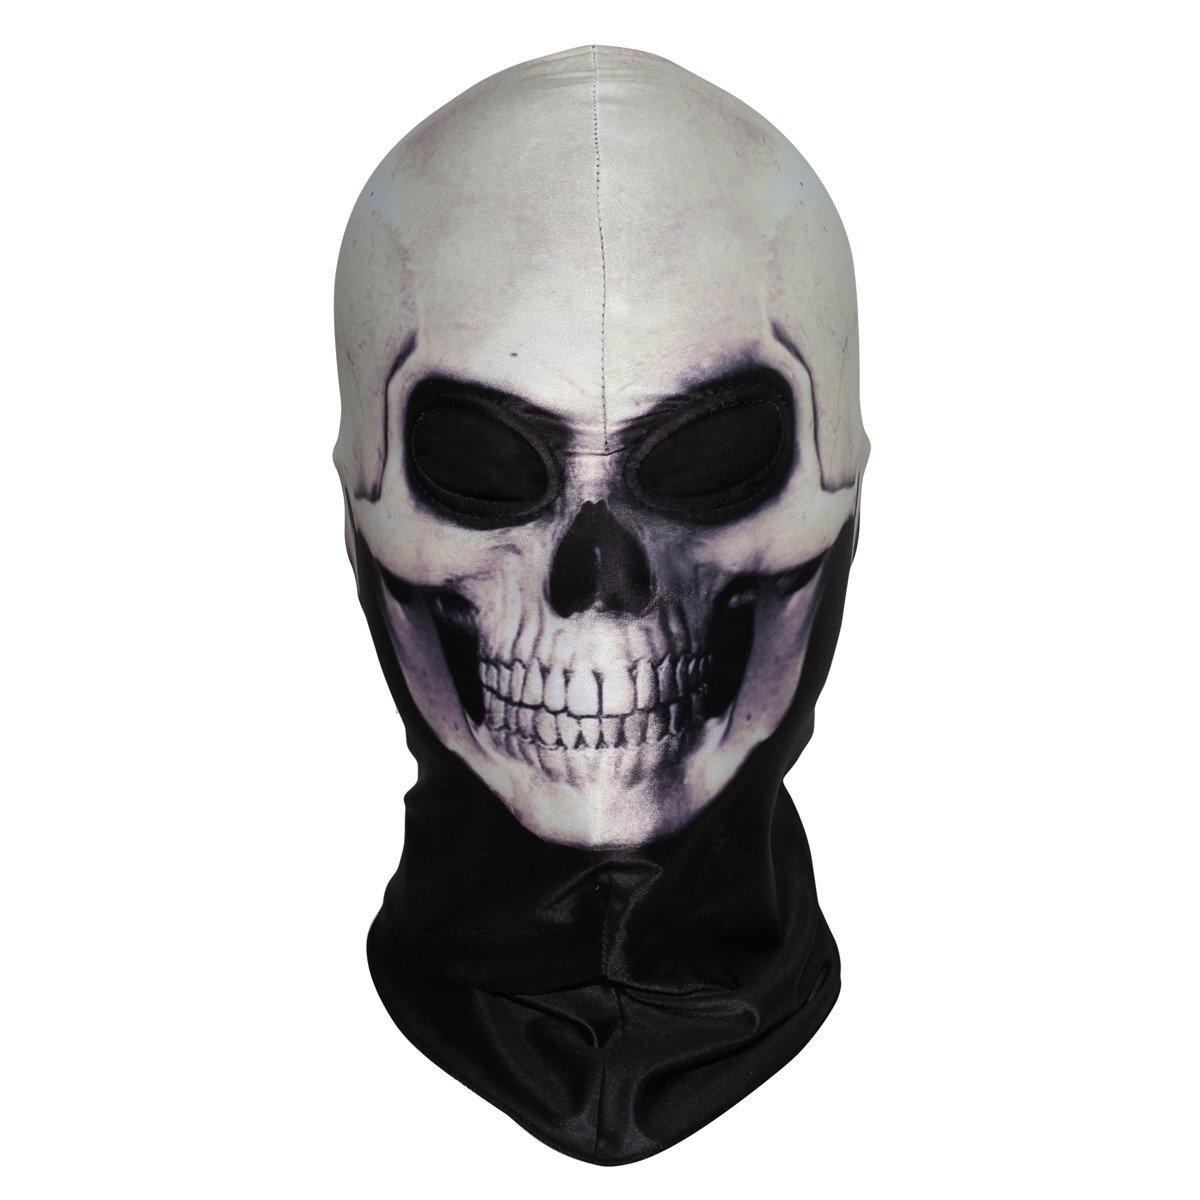 JIUSY 3D Skeleton Lycra Masks Scary Skull Balaclavas Ghost Headwear Cosply Costume Halloween Party Ski Full Face Mask